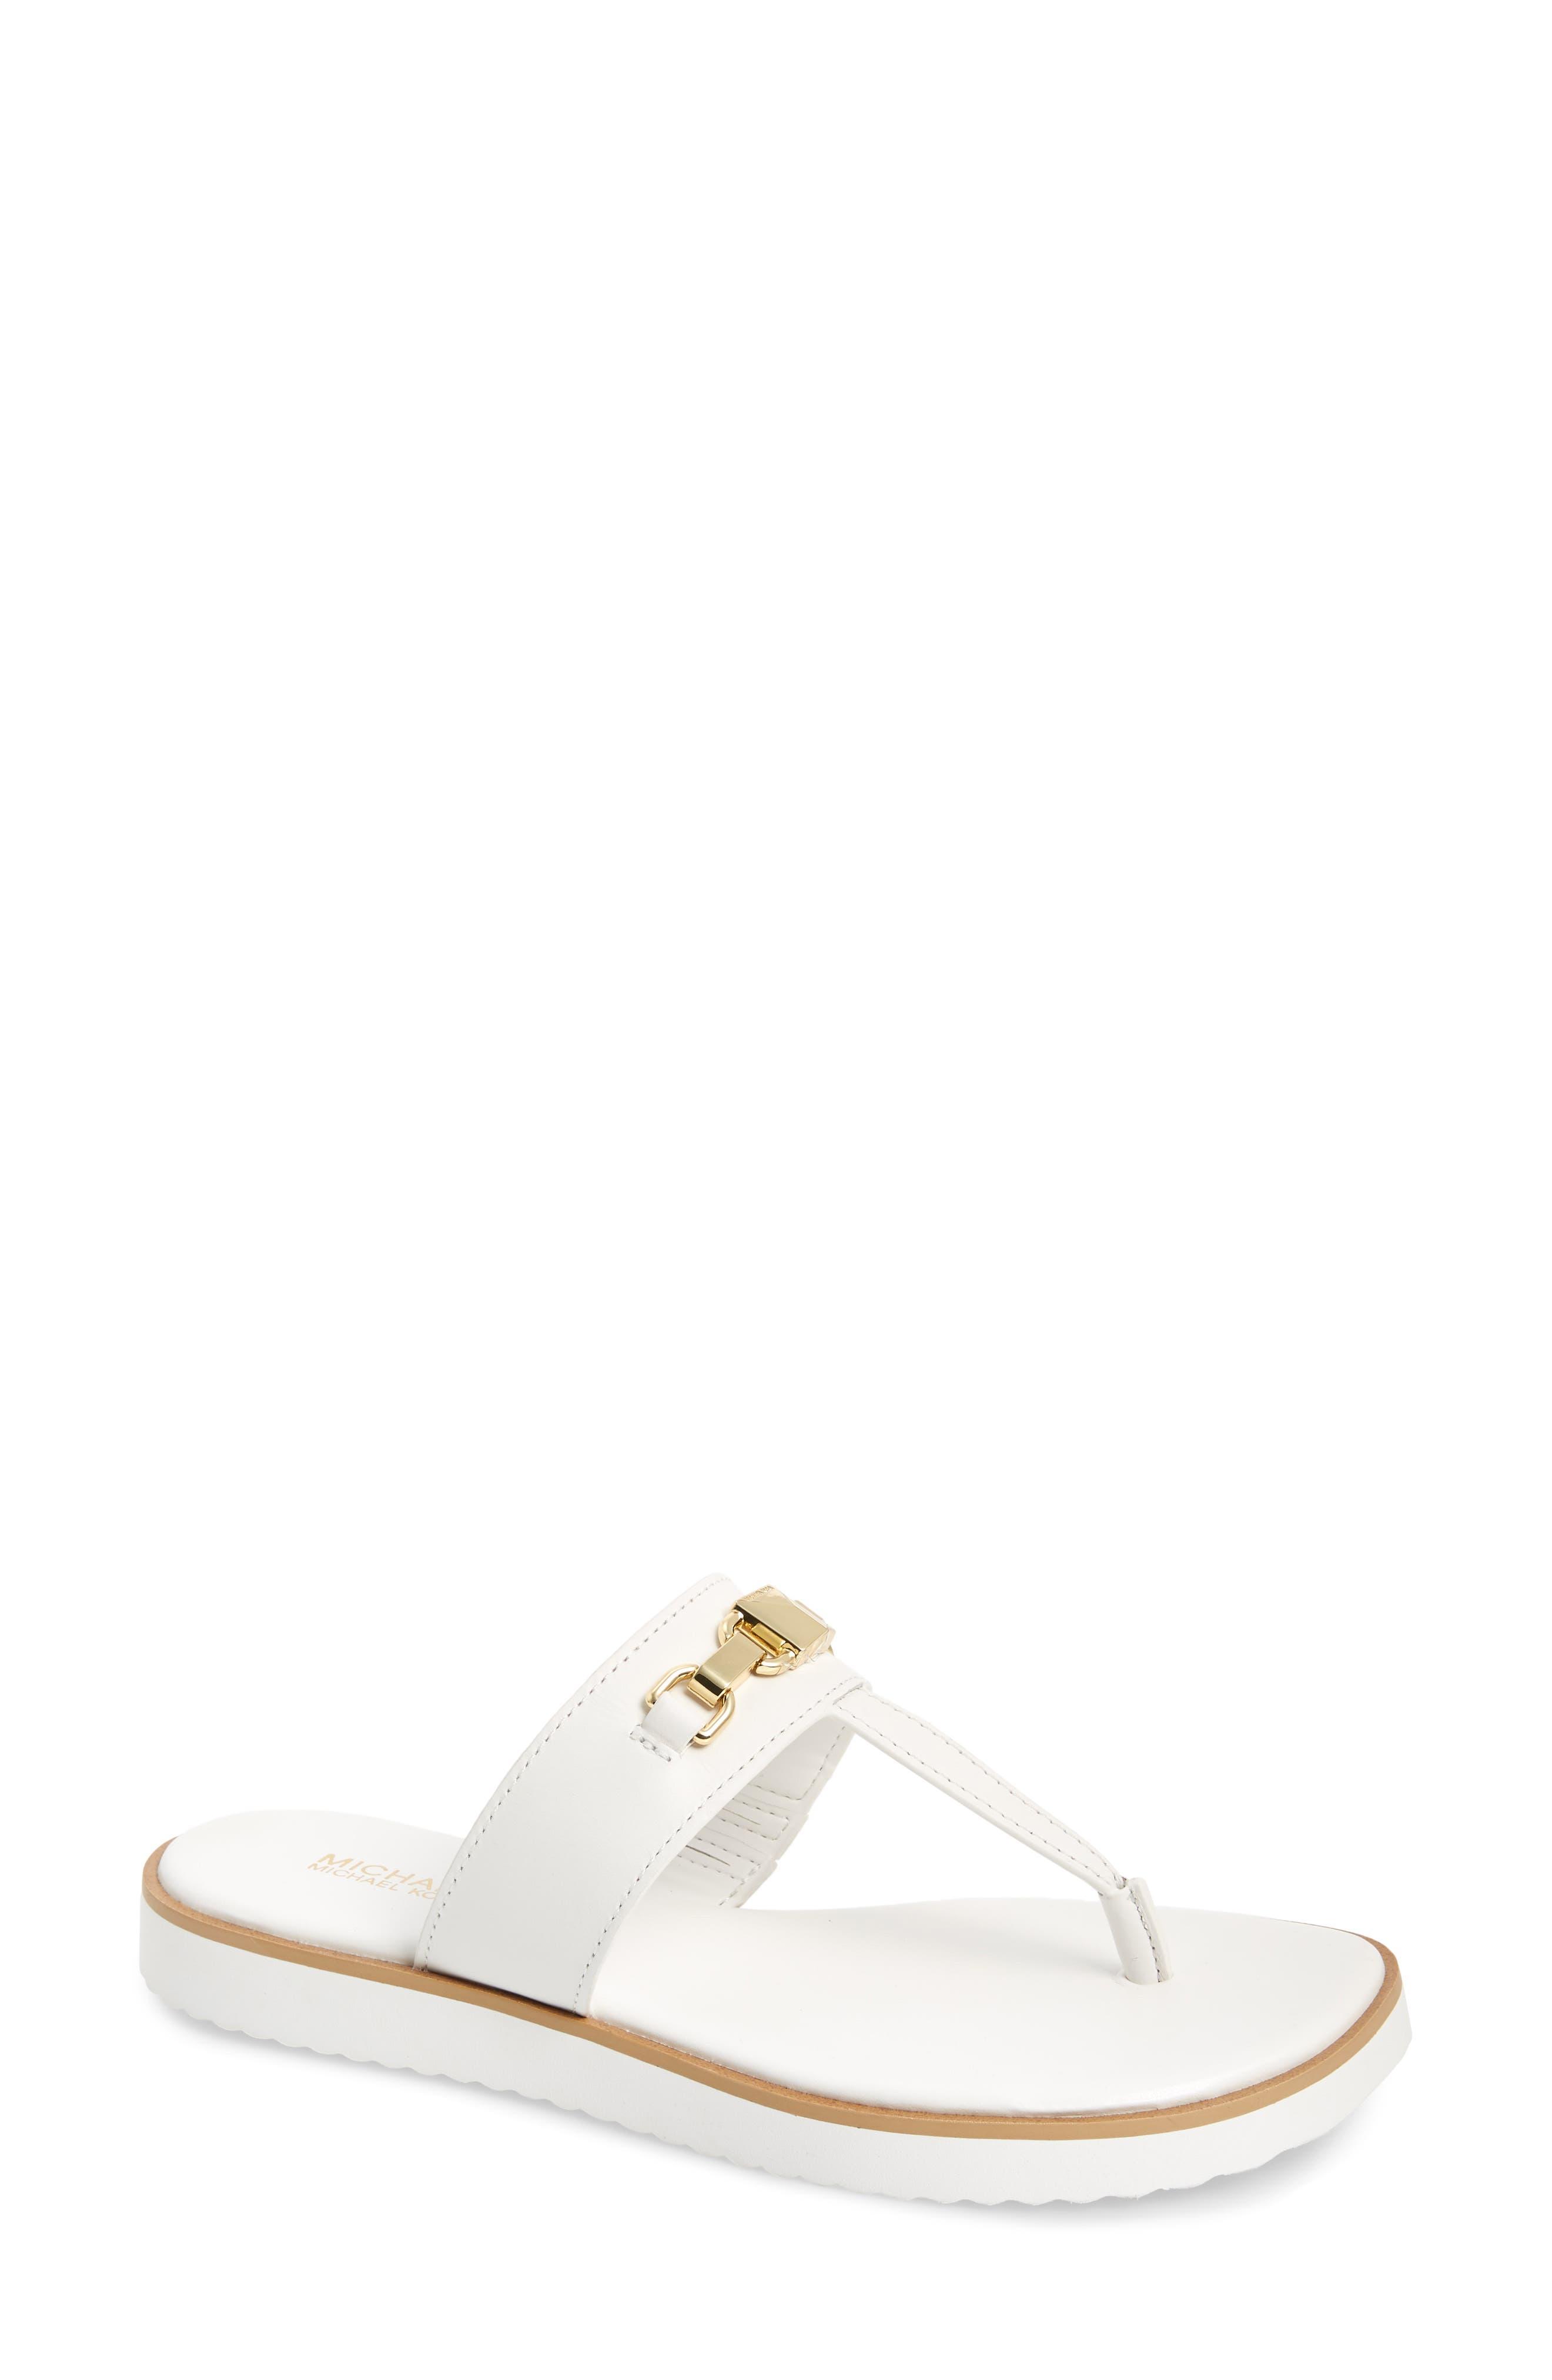 Michael Michael Kors Charlton Flip Flop- White